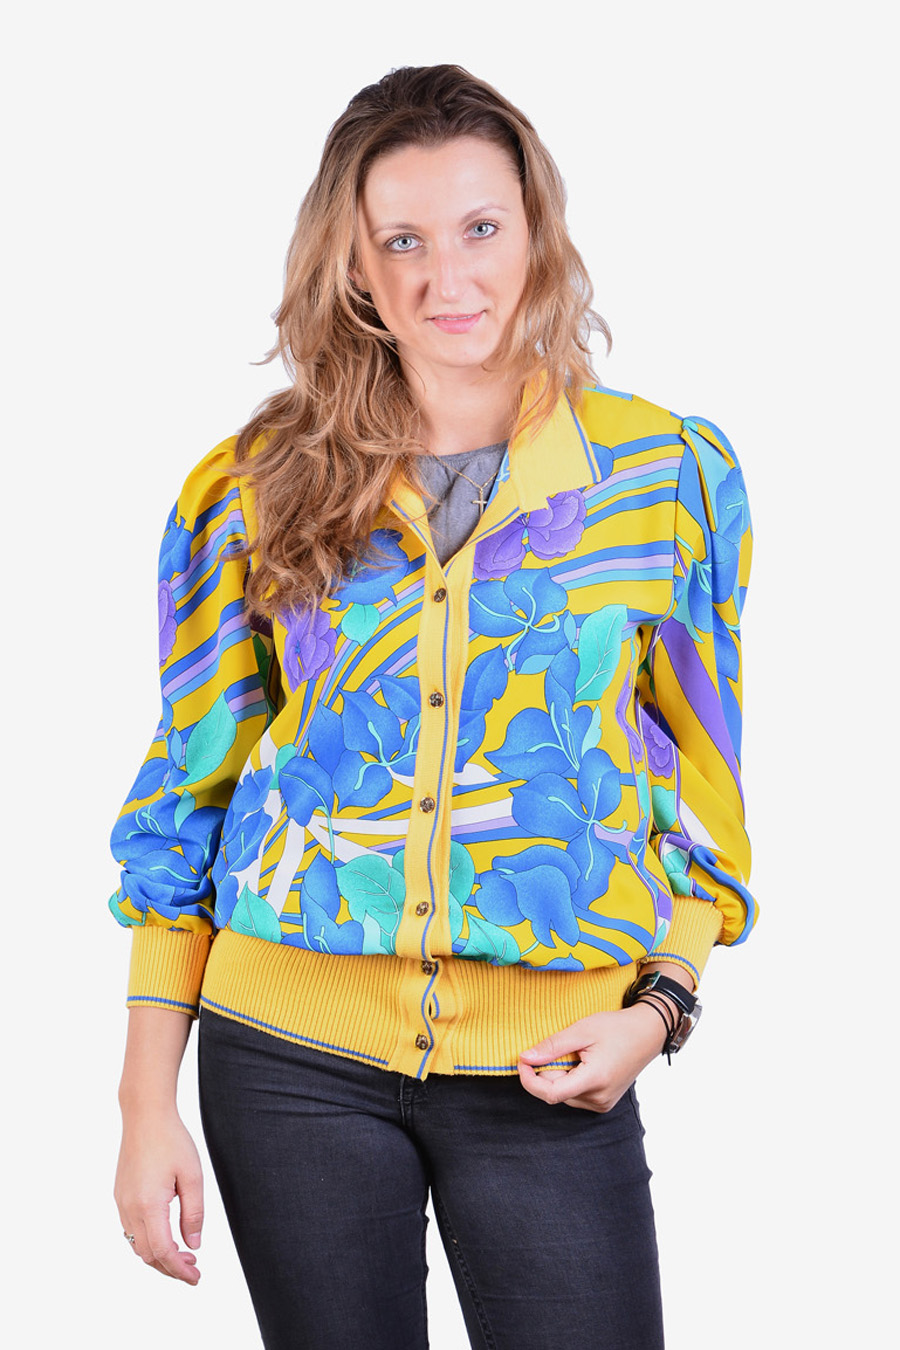 Vintage Robert Janan jacket